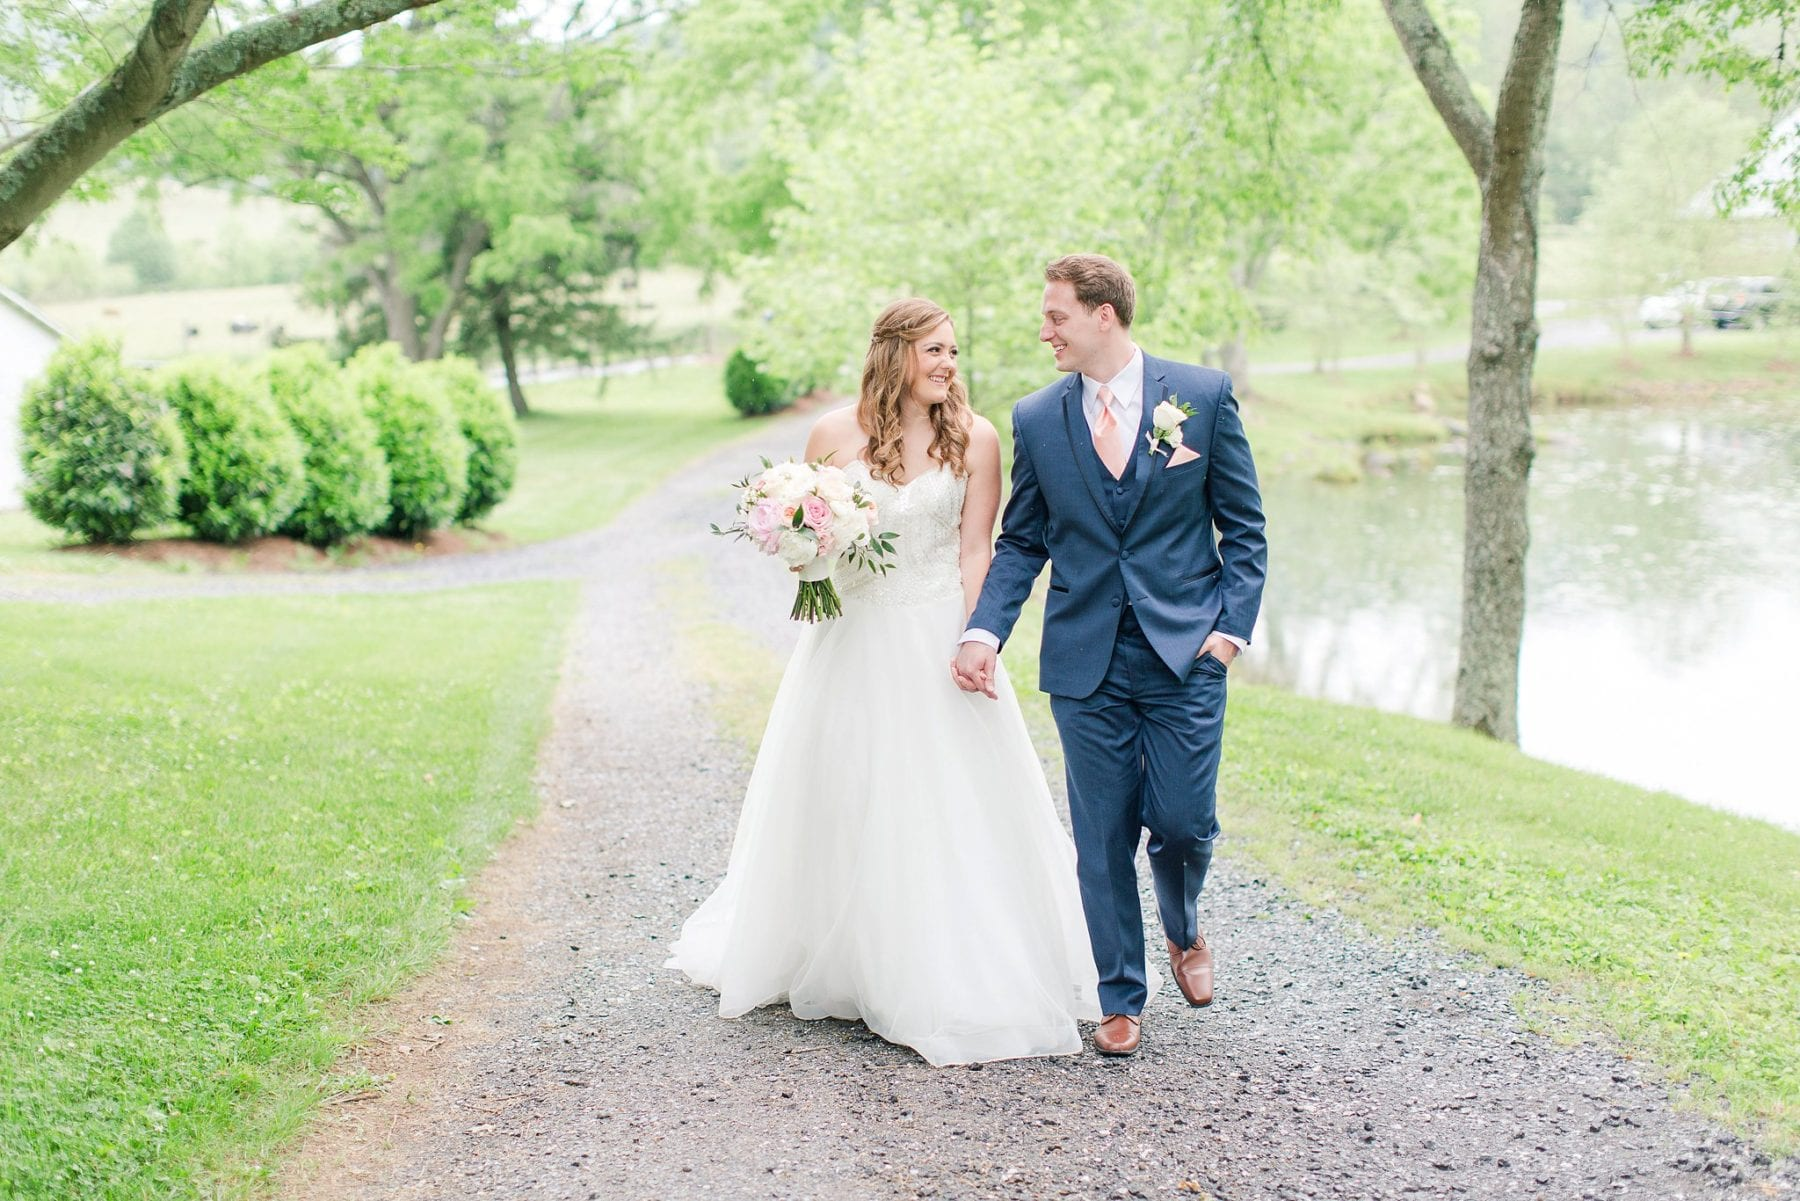 Justin & Megan Big Spring Farm Wedding Photos-120.jpg